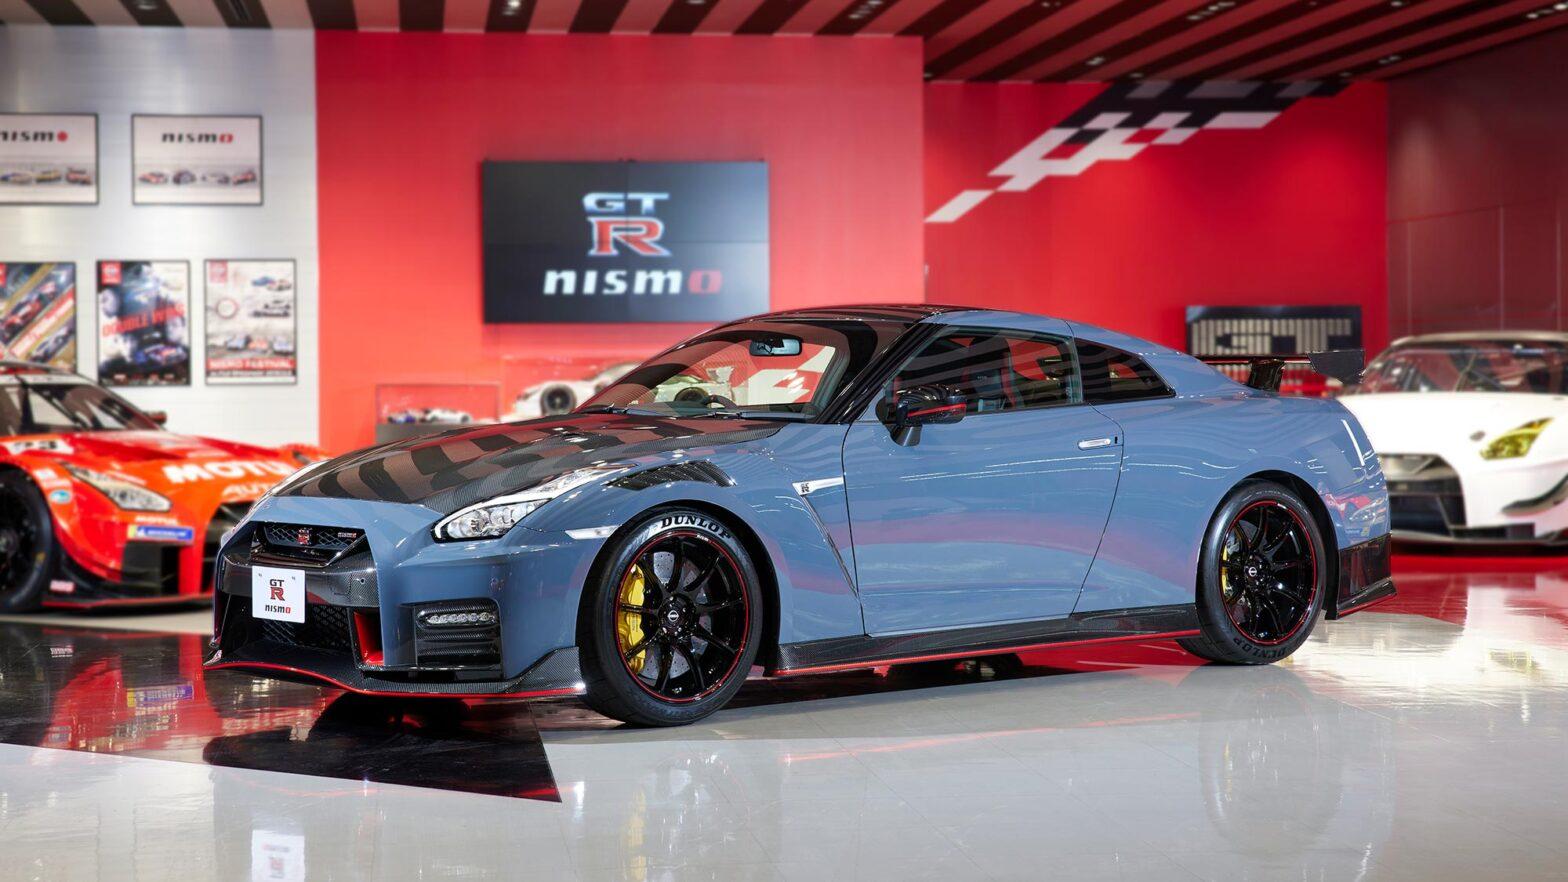 2022 Nissan GT-R NISMO Special Edition